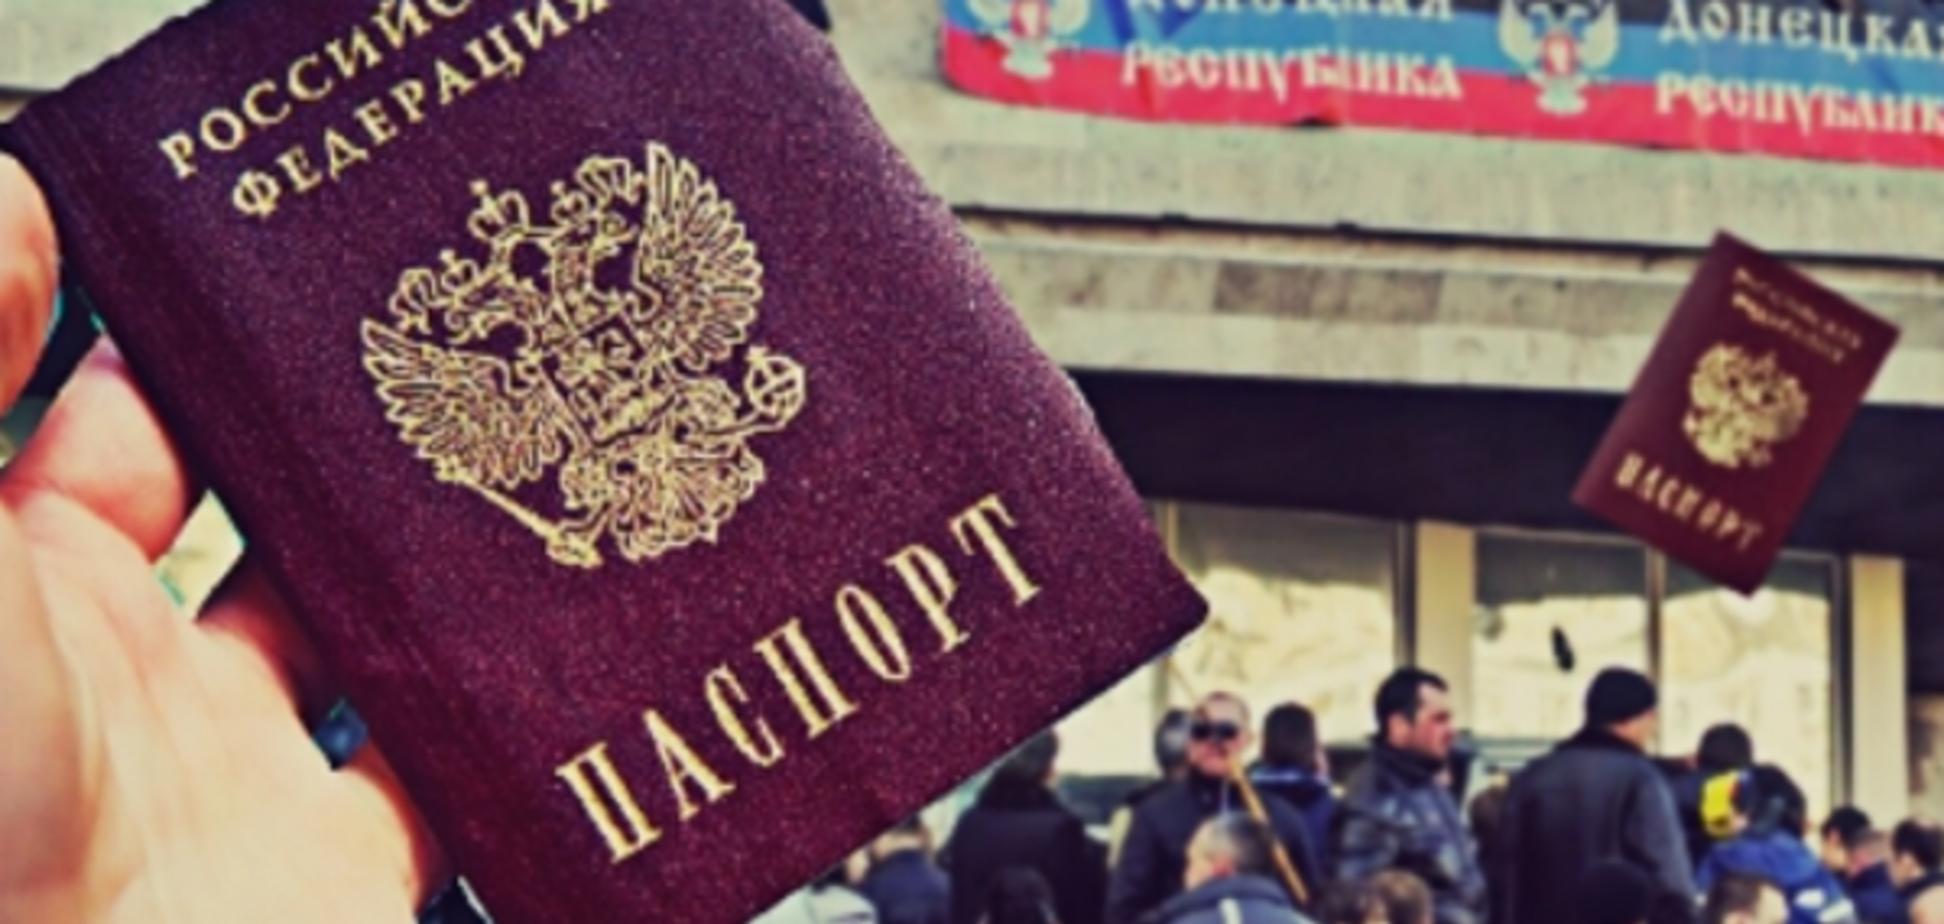 В 'Л/ДНР' терористи повстали через паспорти РФ